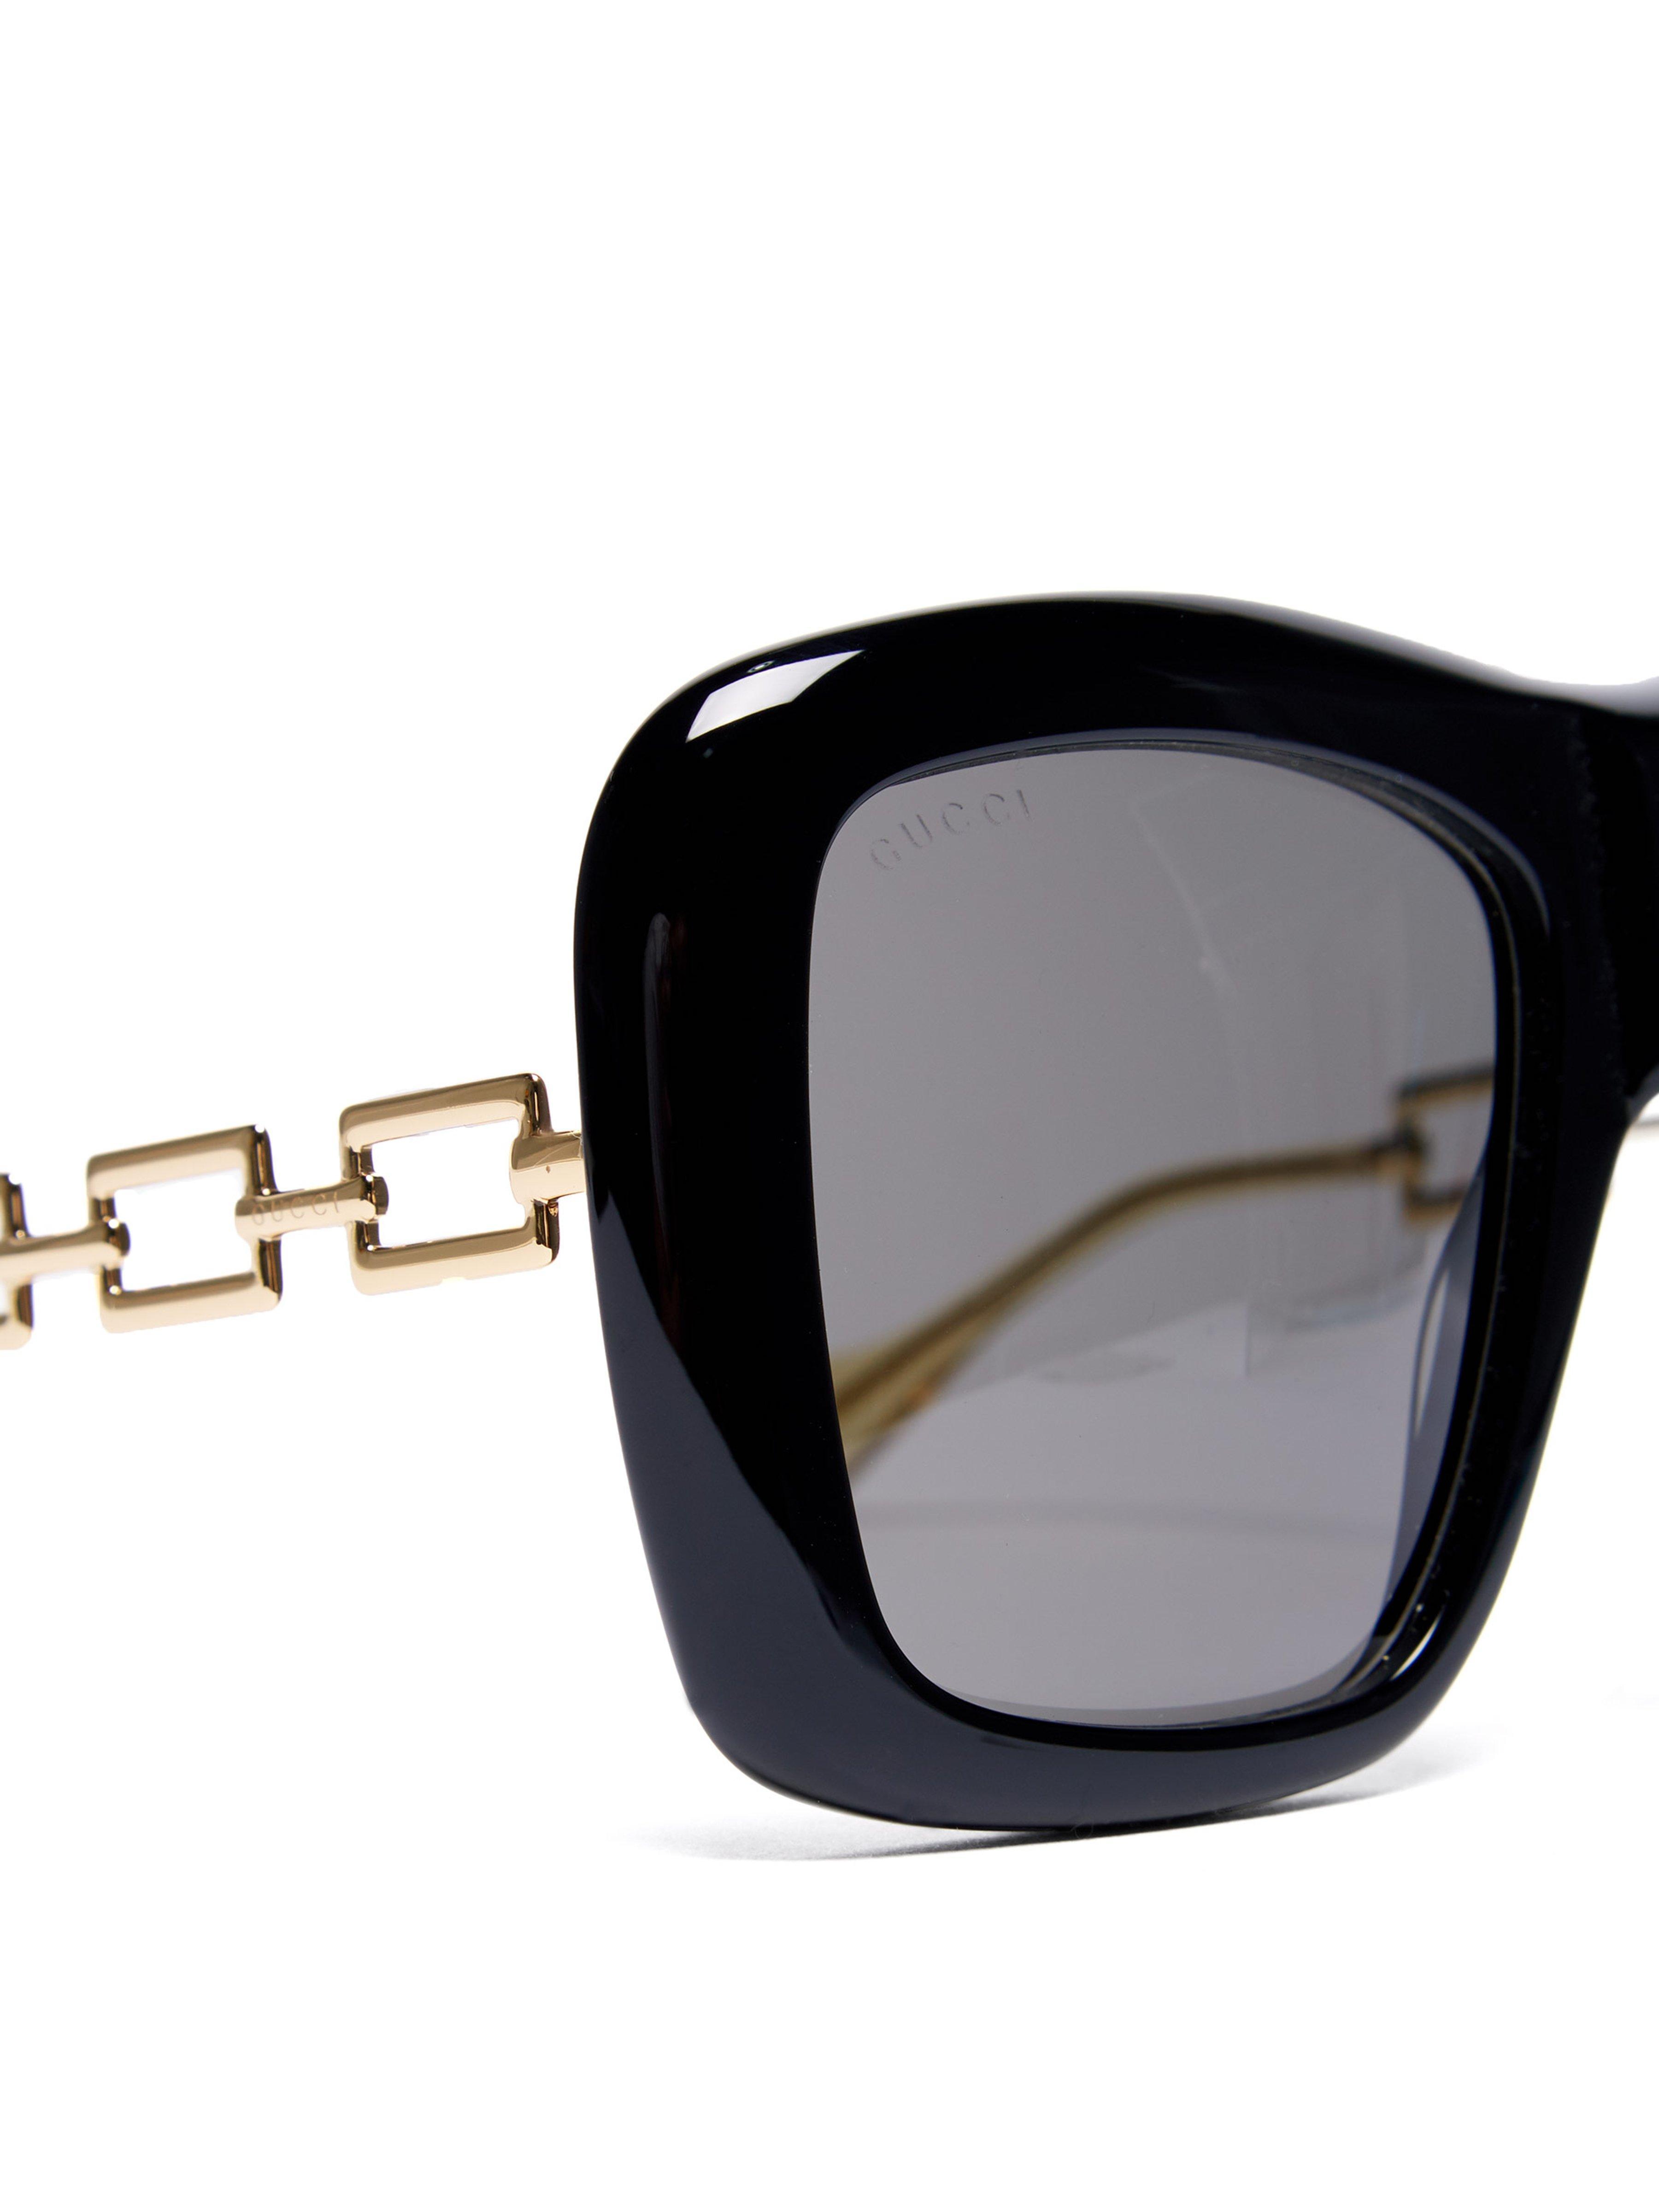 5342ba5c8e Gucci - Black Oversized Square Frame Acetate Sunglasses - Lyst. View  fullscreen